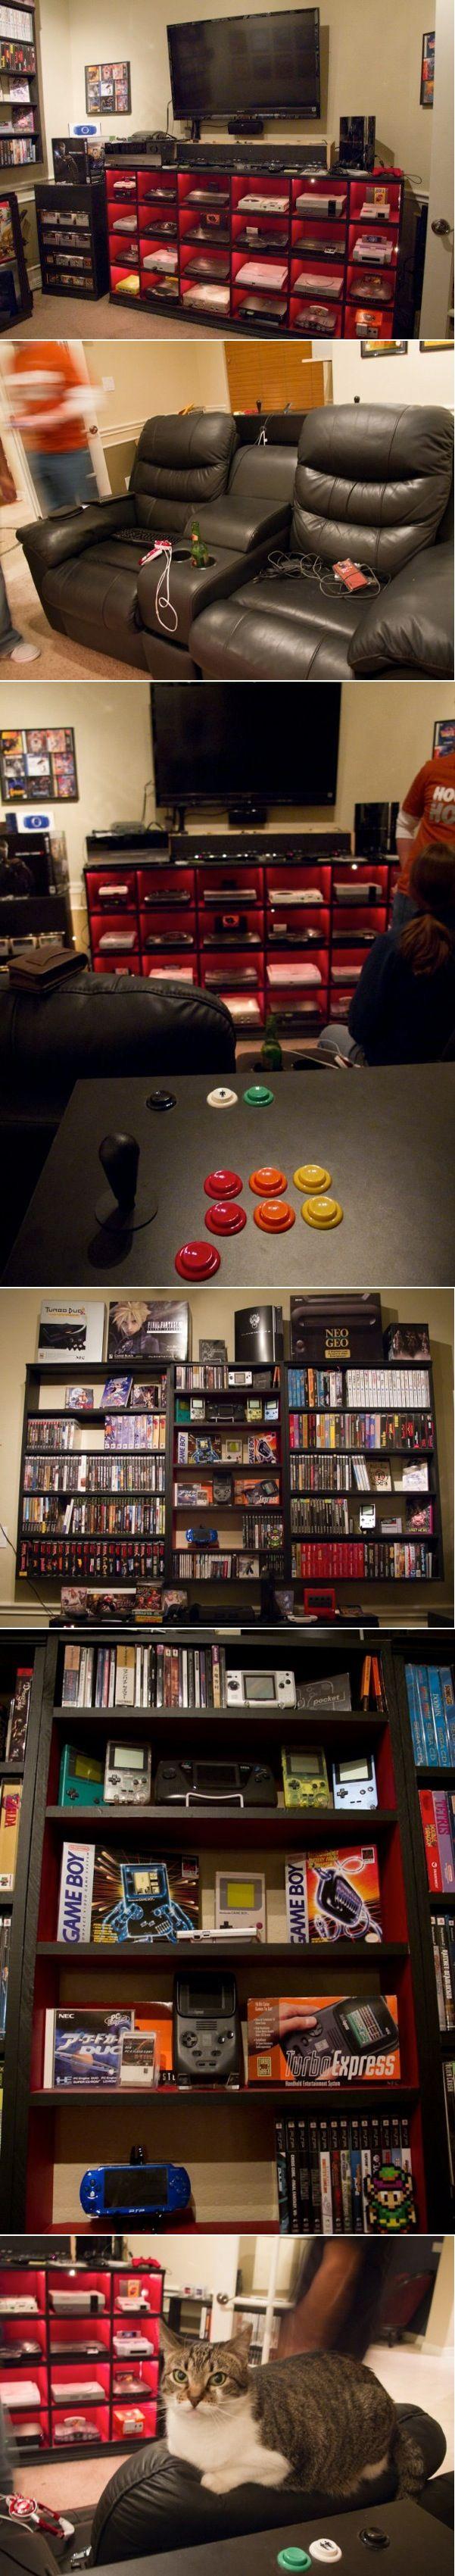 Best puter gaming room ideas on Pinterest